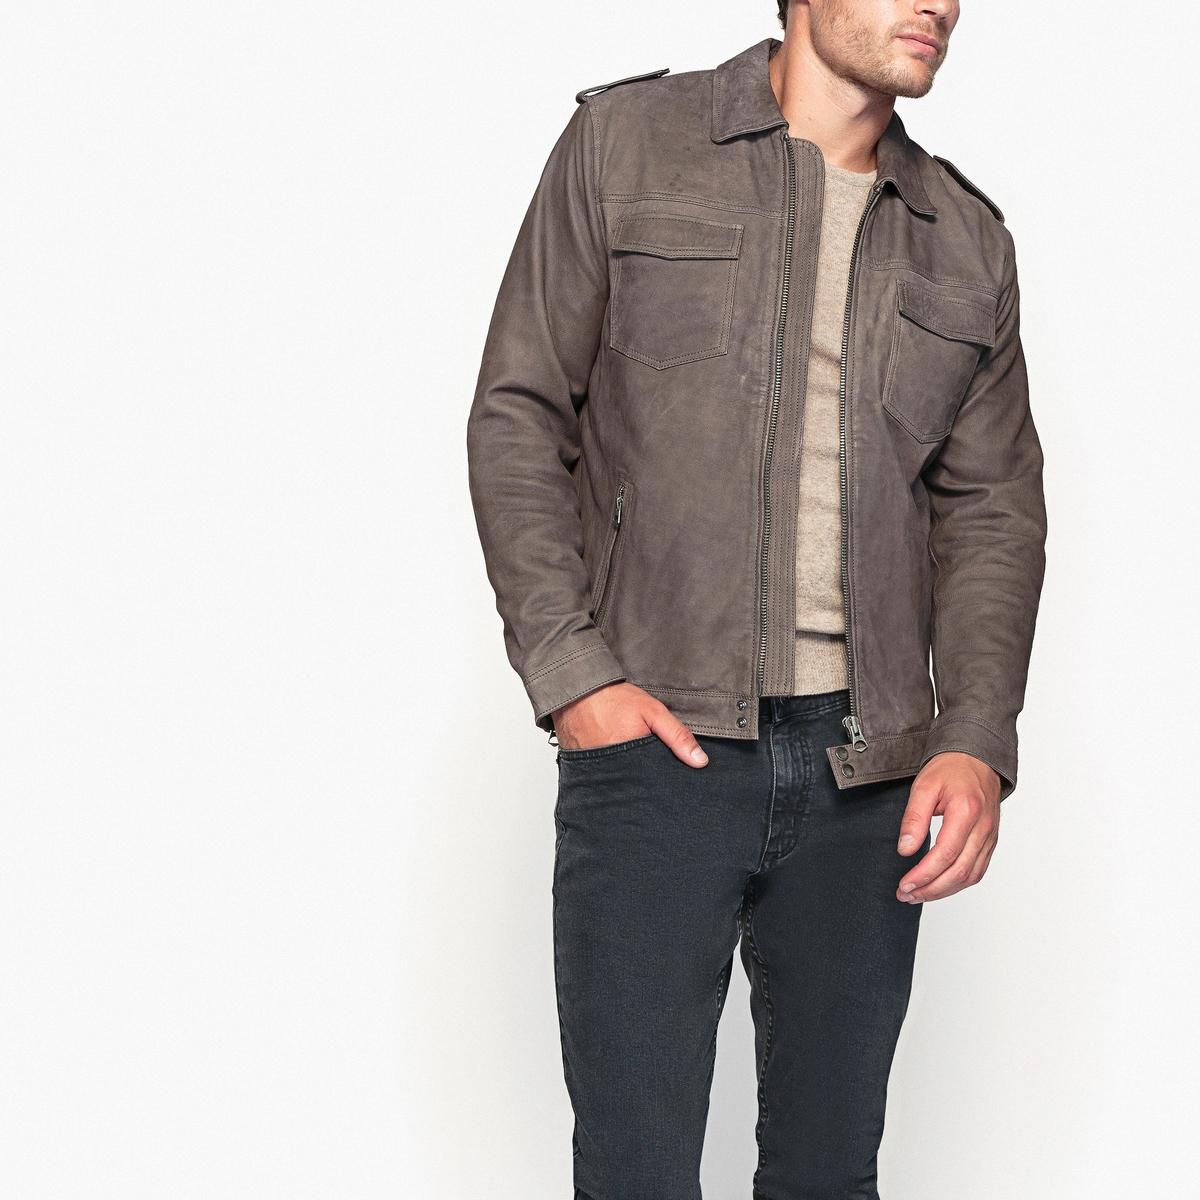 Блузон кожаный демисезонный блузон кожаный